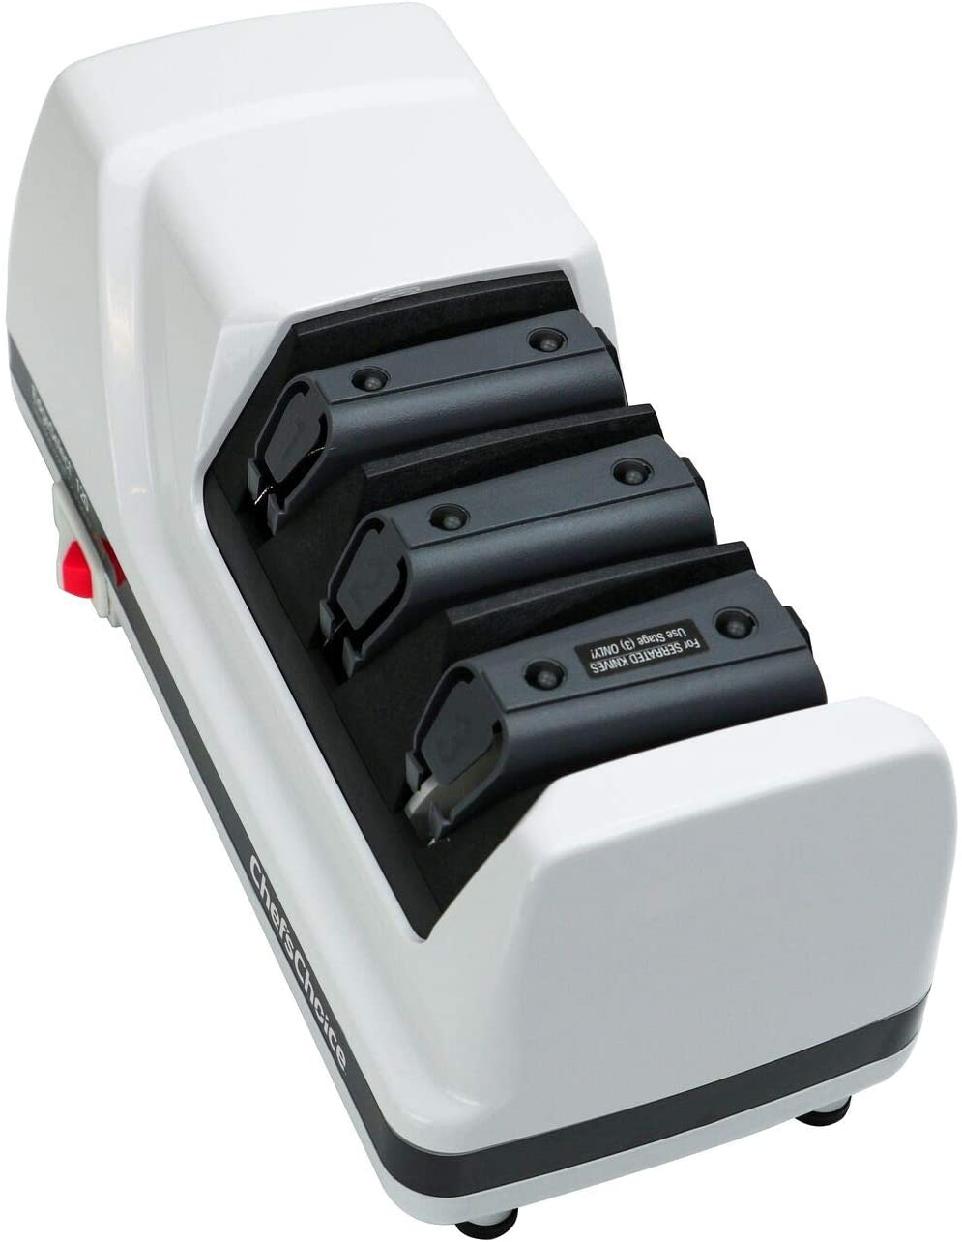 Chef's Choice(シェフチョイス)電動式包丁研ぎ器 120Nの商品画像3